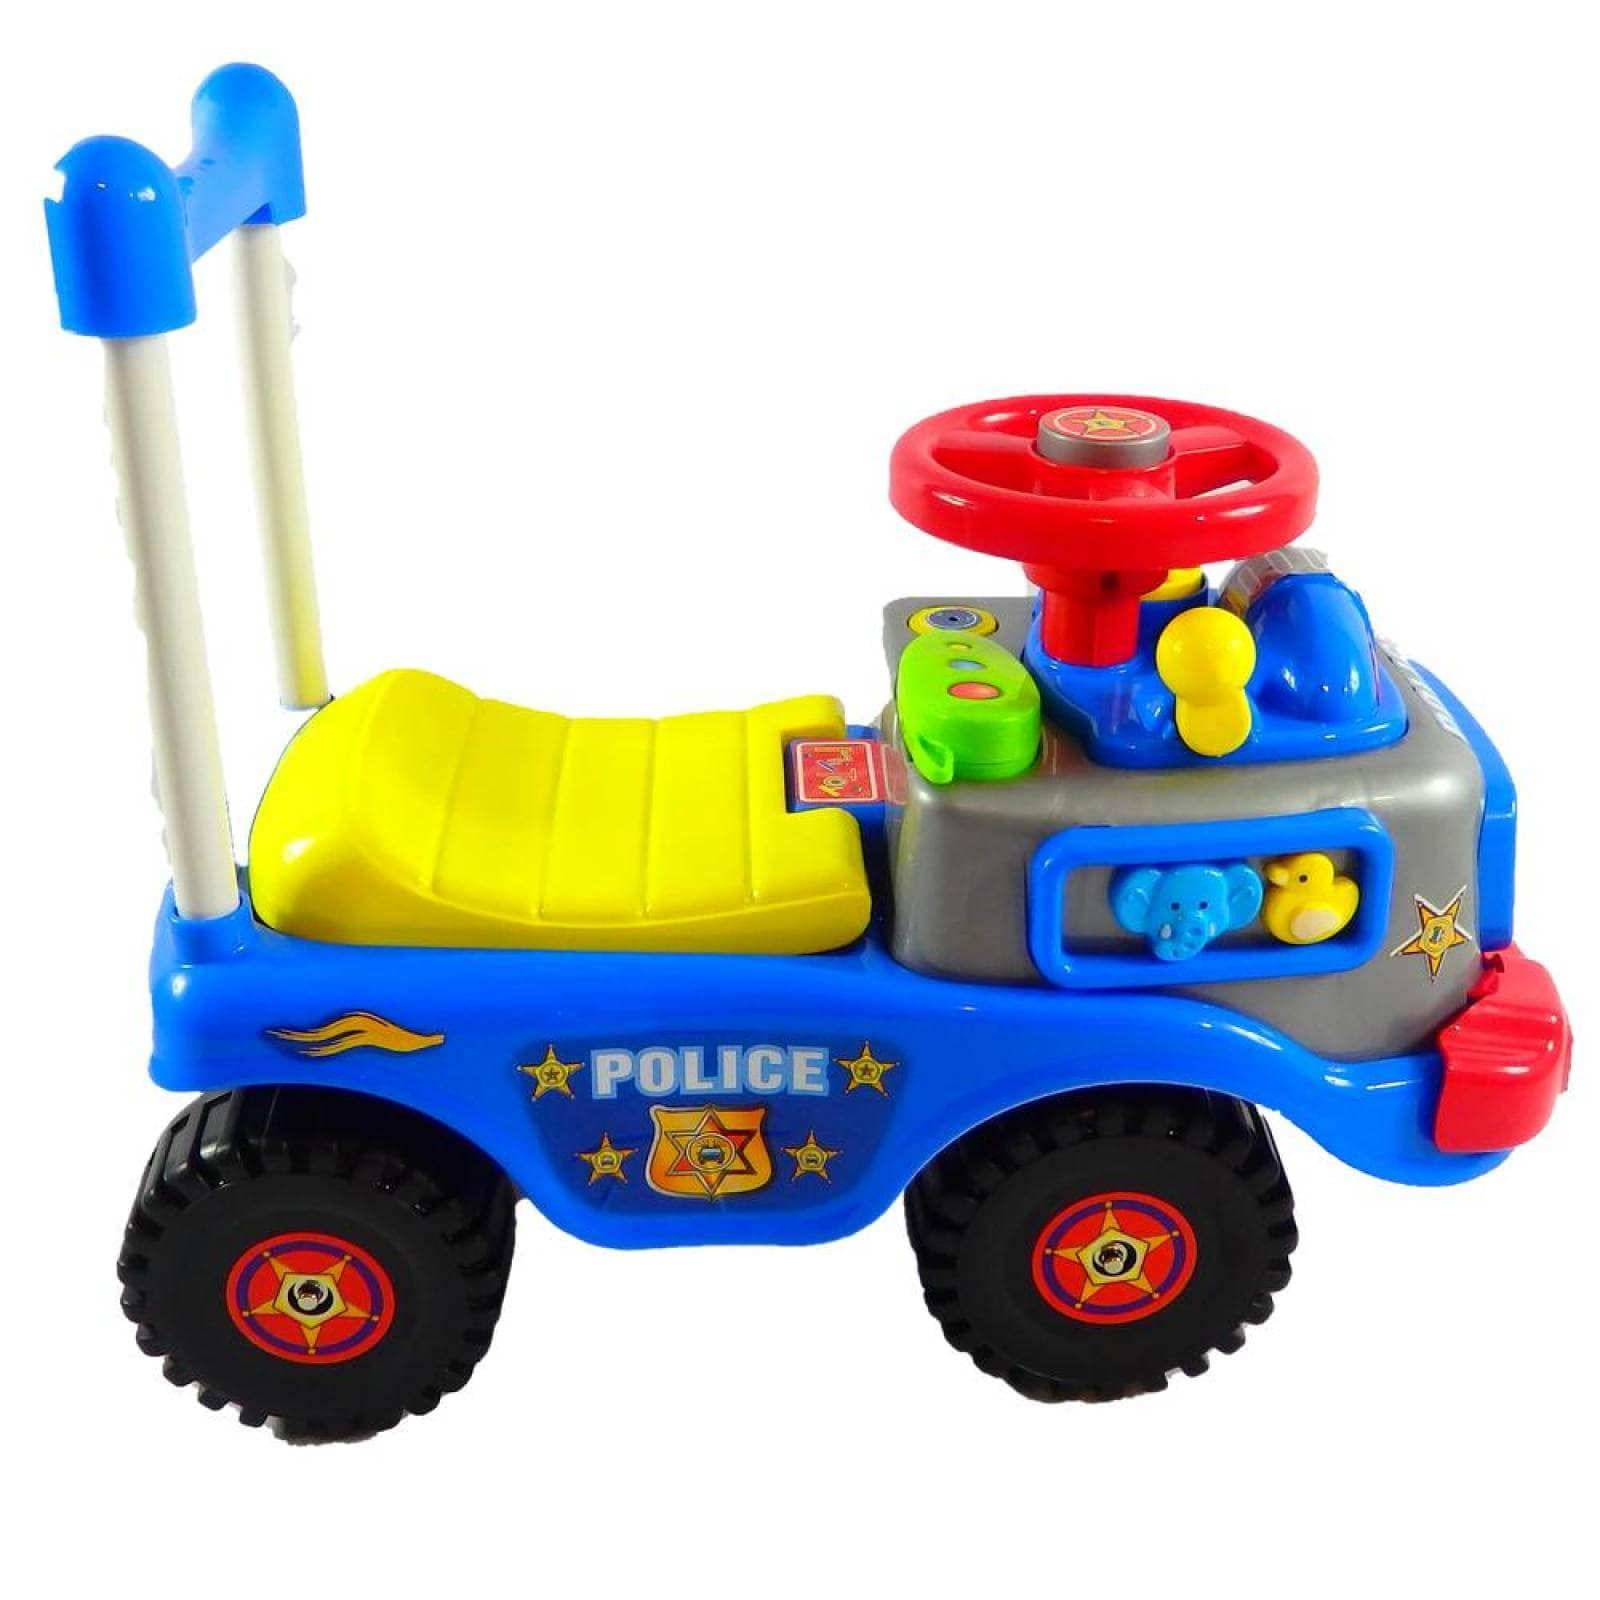 Montable Correpasillos de Policia con sonido Azul